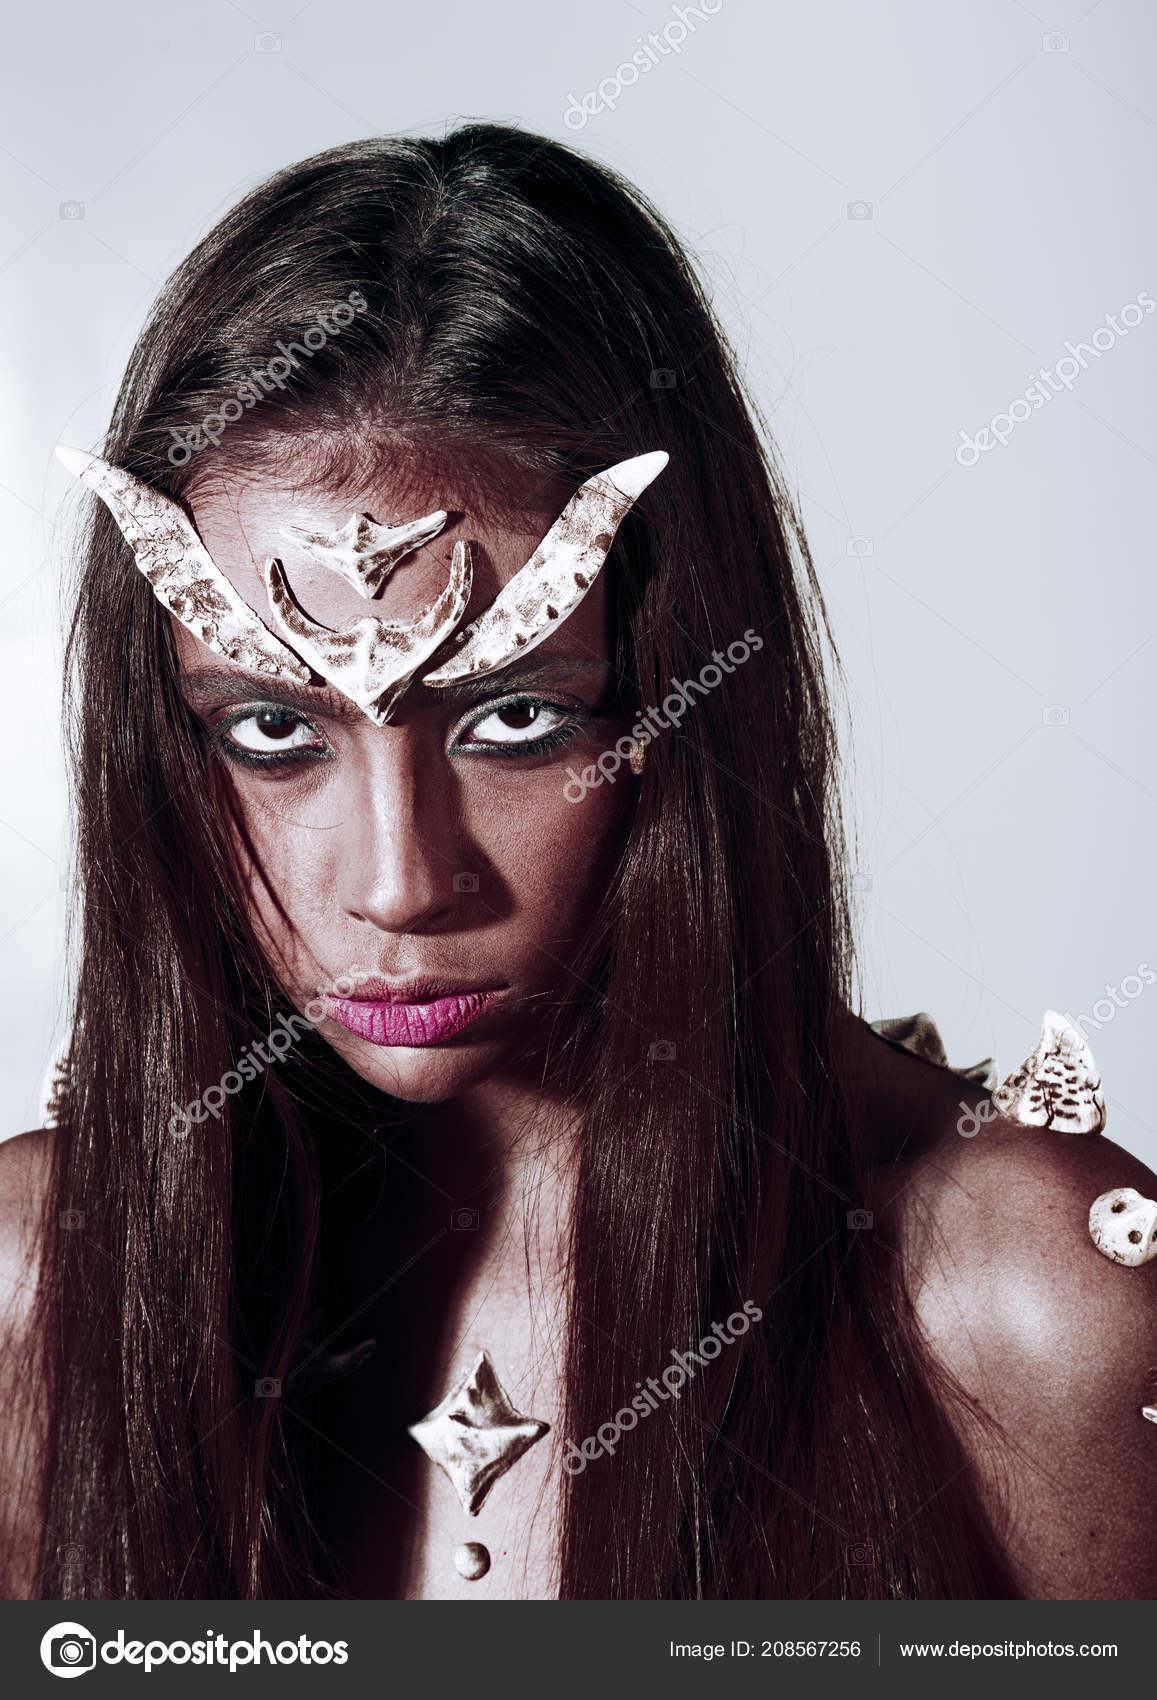 Halloween Makeup Devil Girl.Girl Fantasy Style Makeup Halloween Ideas Concept Woman With Horns